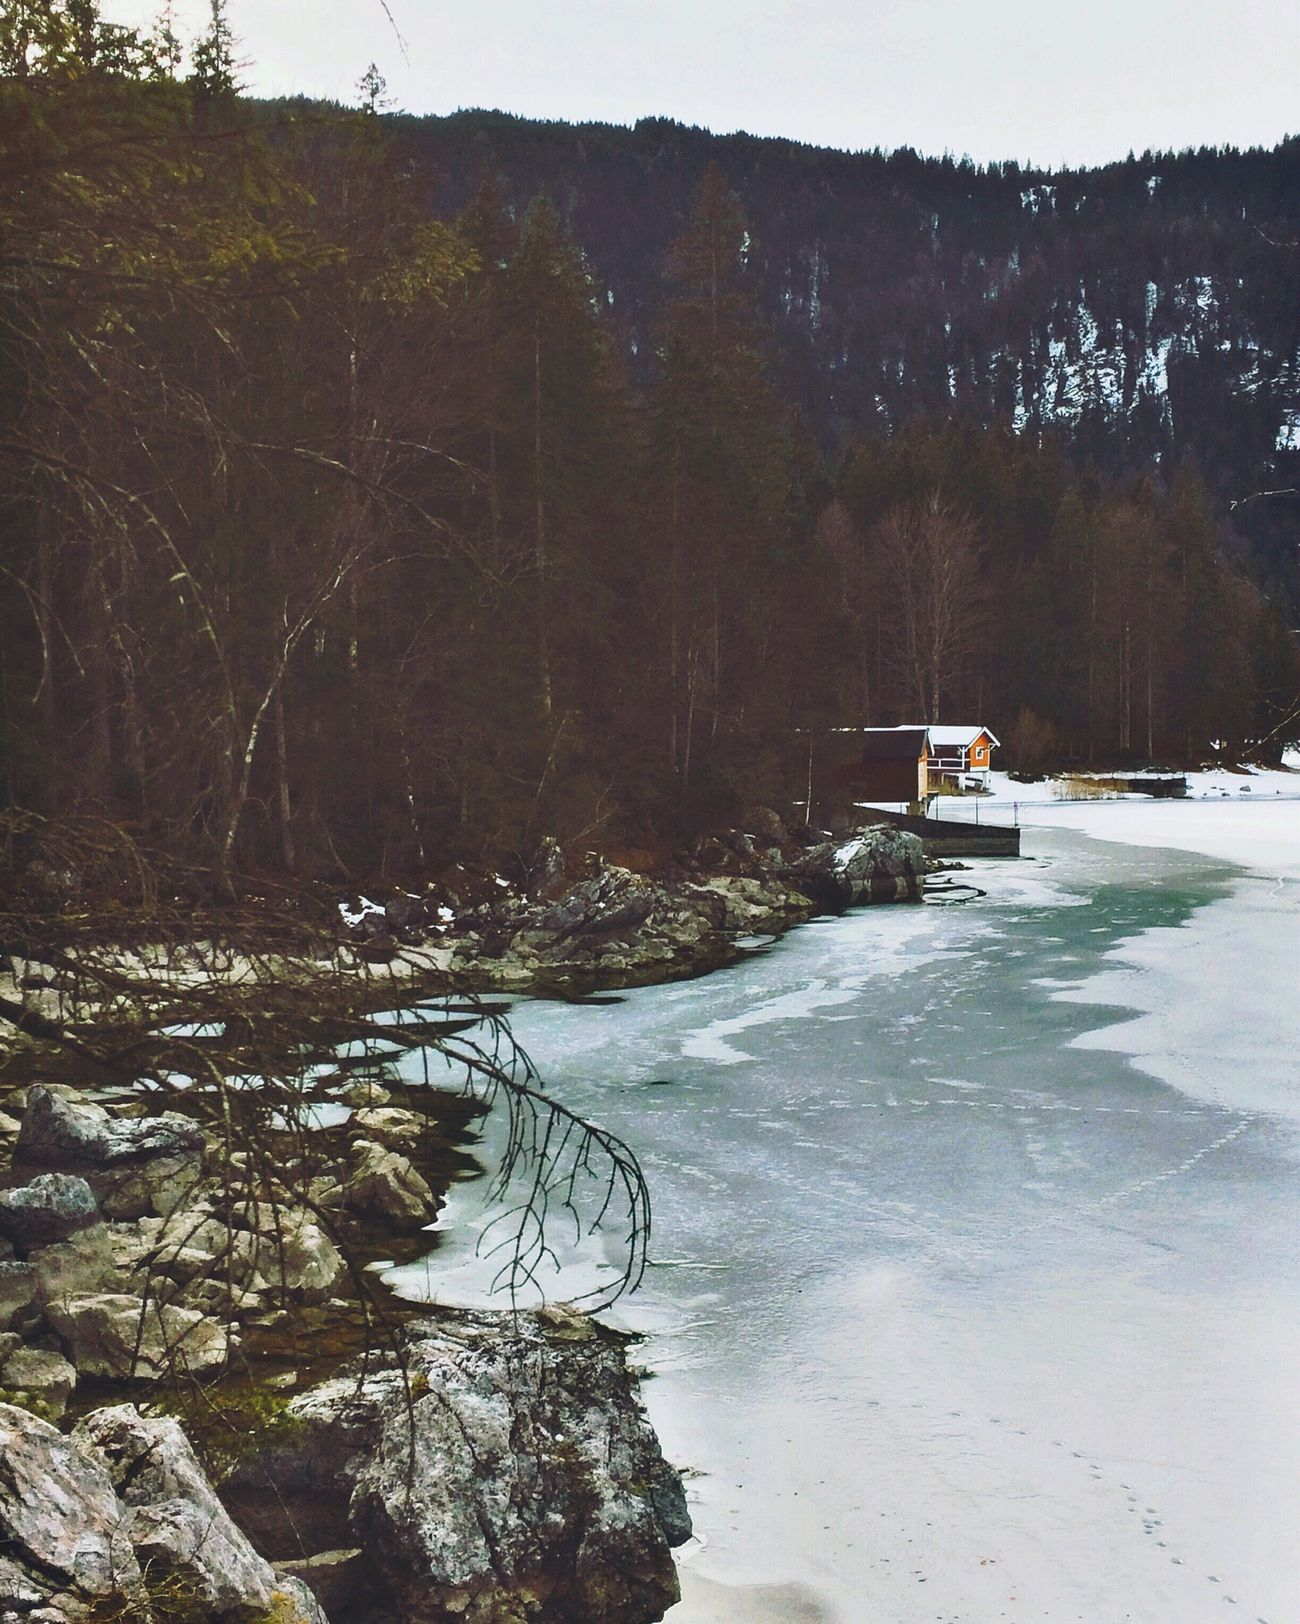 Icy lake. IPhoneography Winter Bavarian Alps EyeEm Best Shots - Nature Ice Naturelovers Lake EyeEm Nature Lover Eibsee Bavaria Winter Wonderland Wintertime The Week Of Eyeem Cabin In The Woods